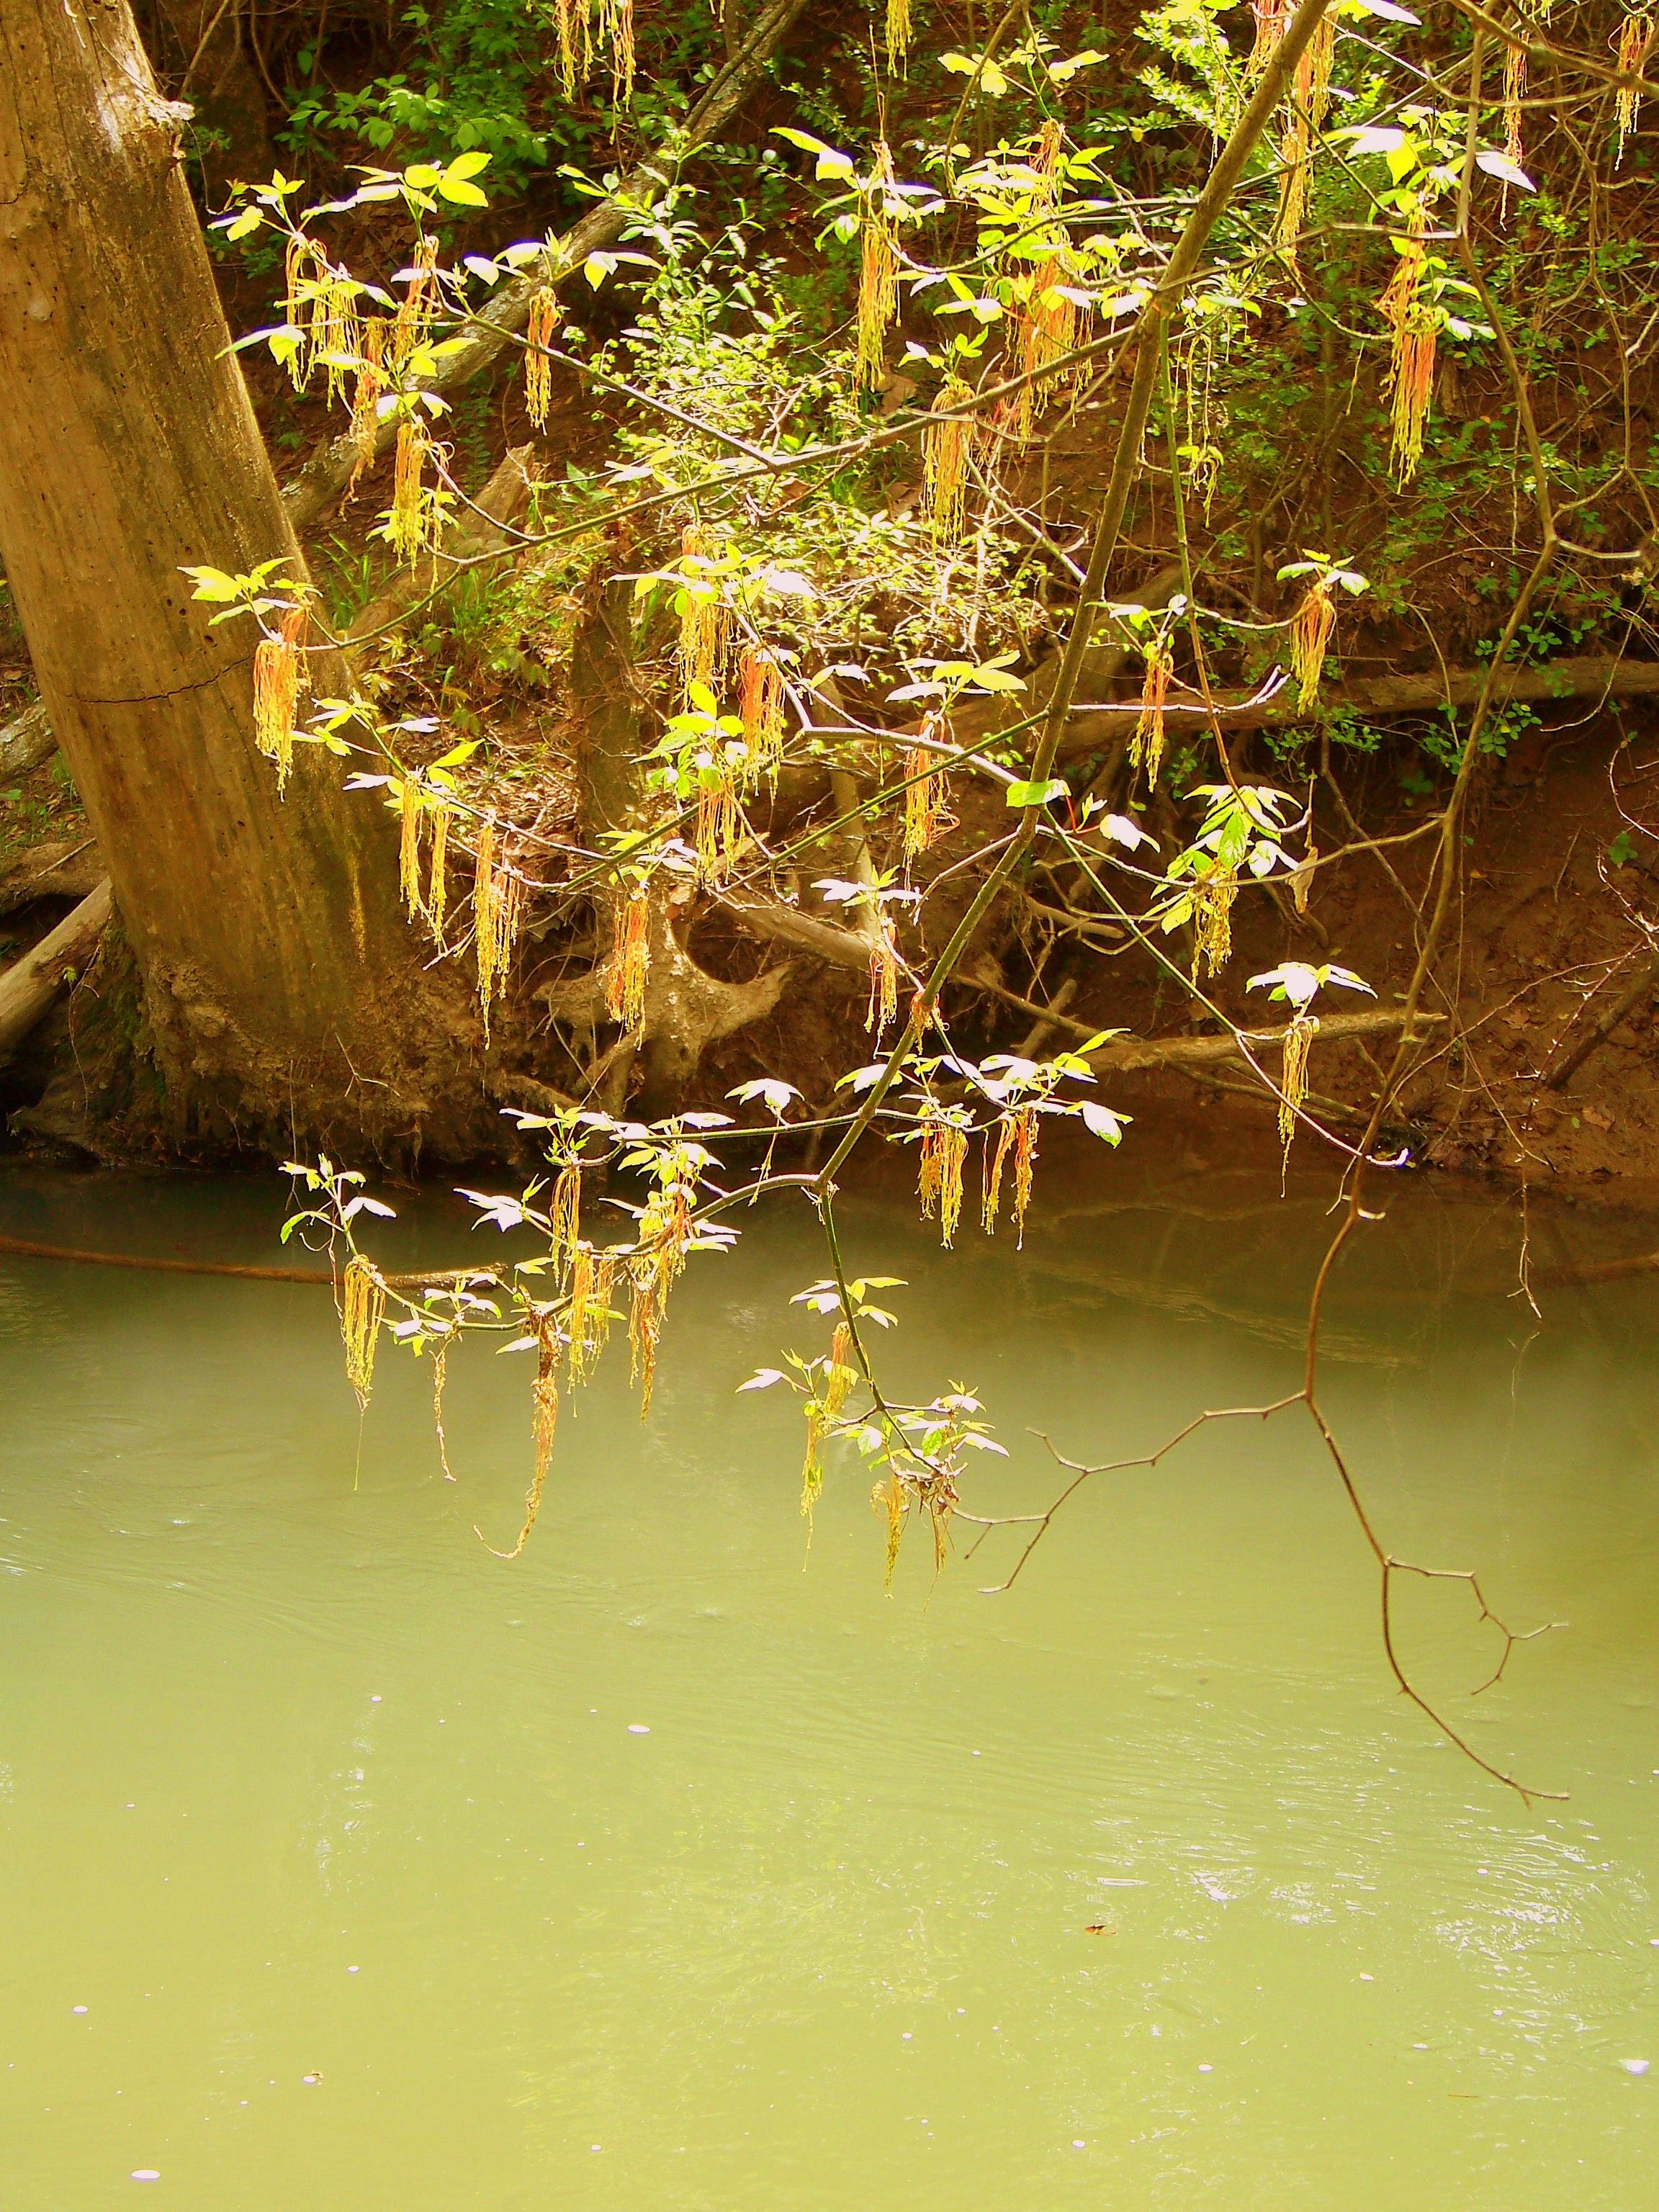 Alder Flowers hang over the river